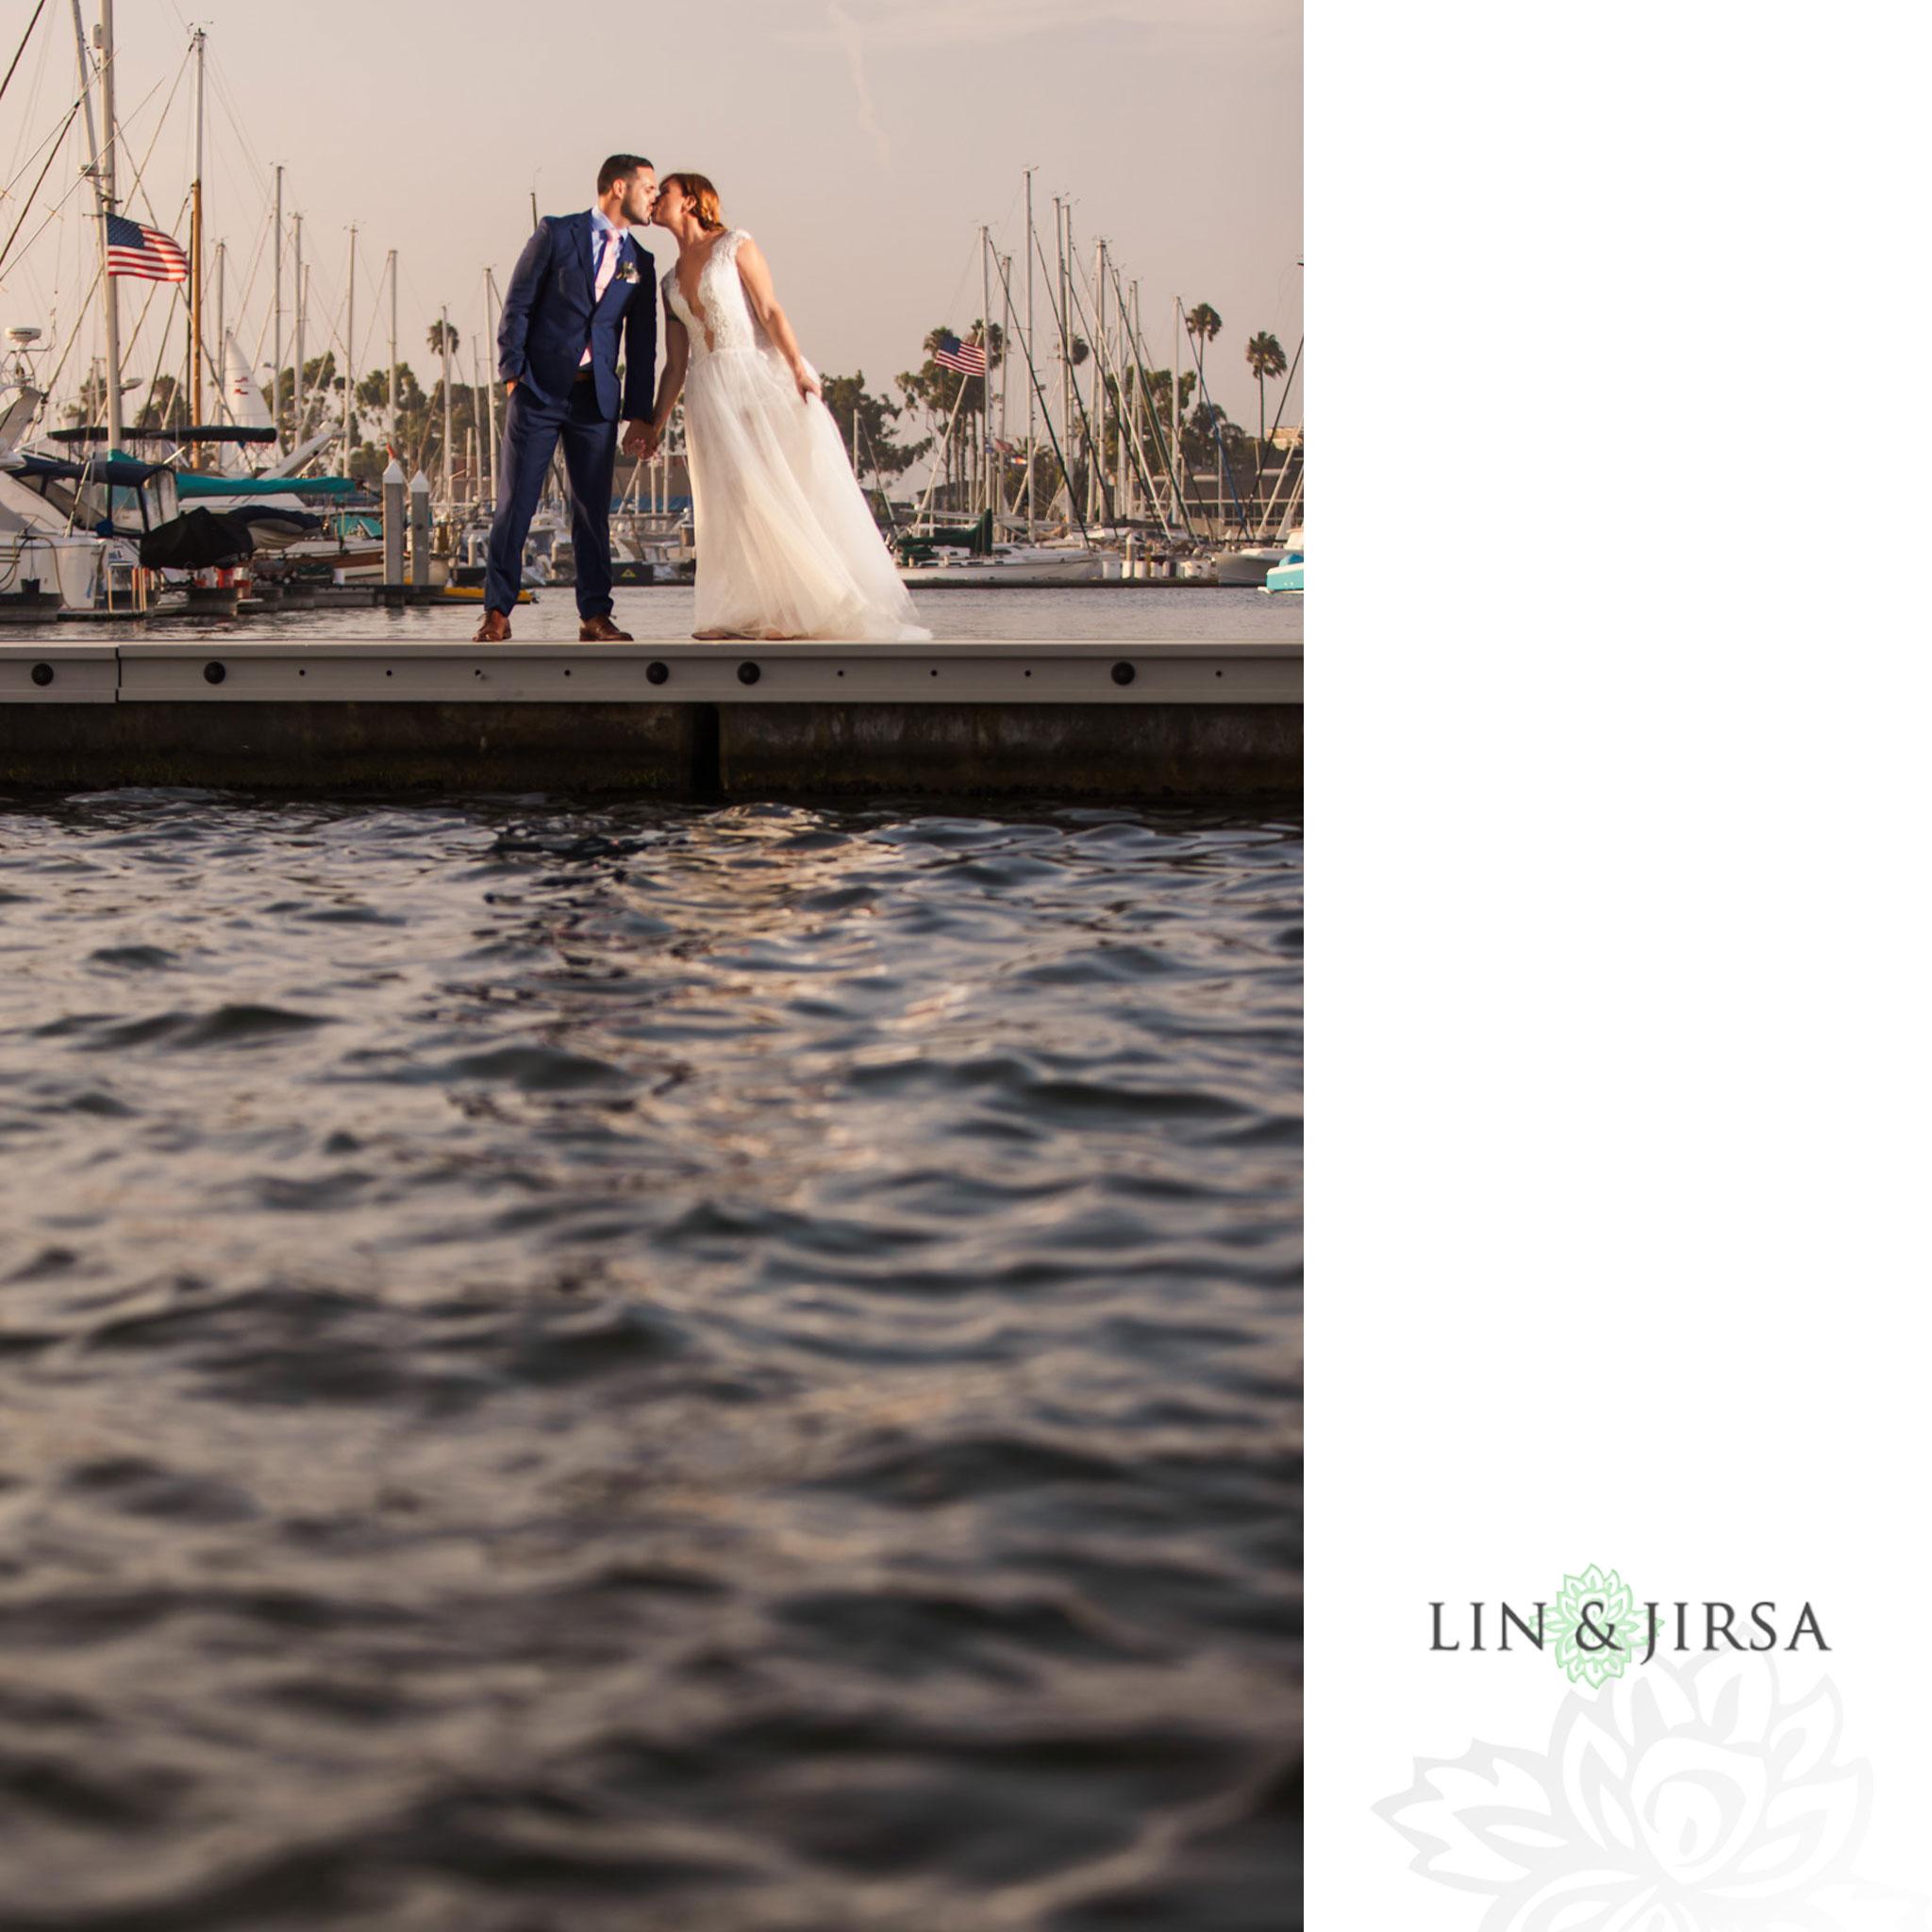 022 marina del rey hotel wedding photography